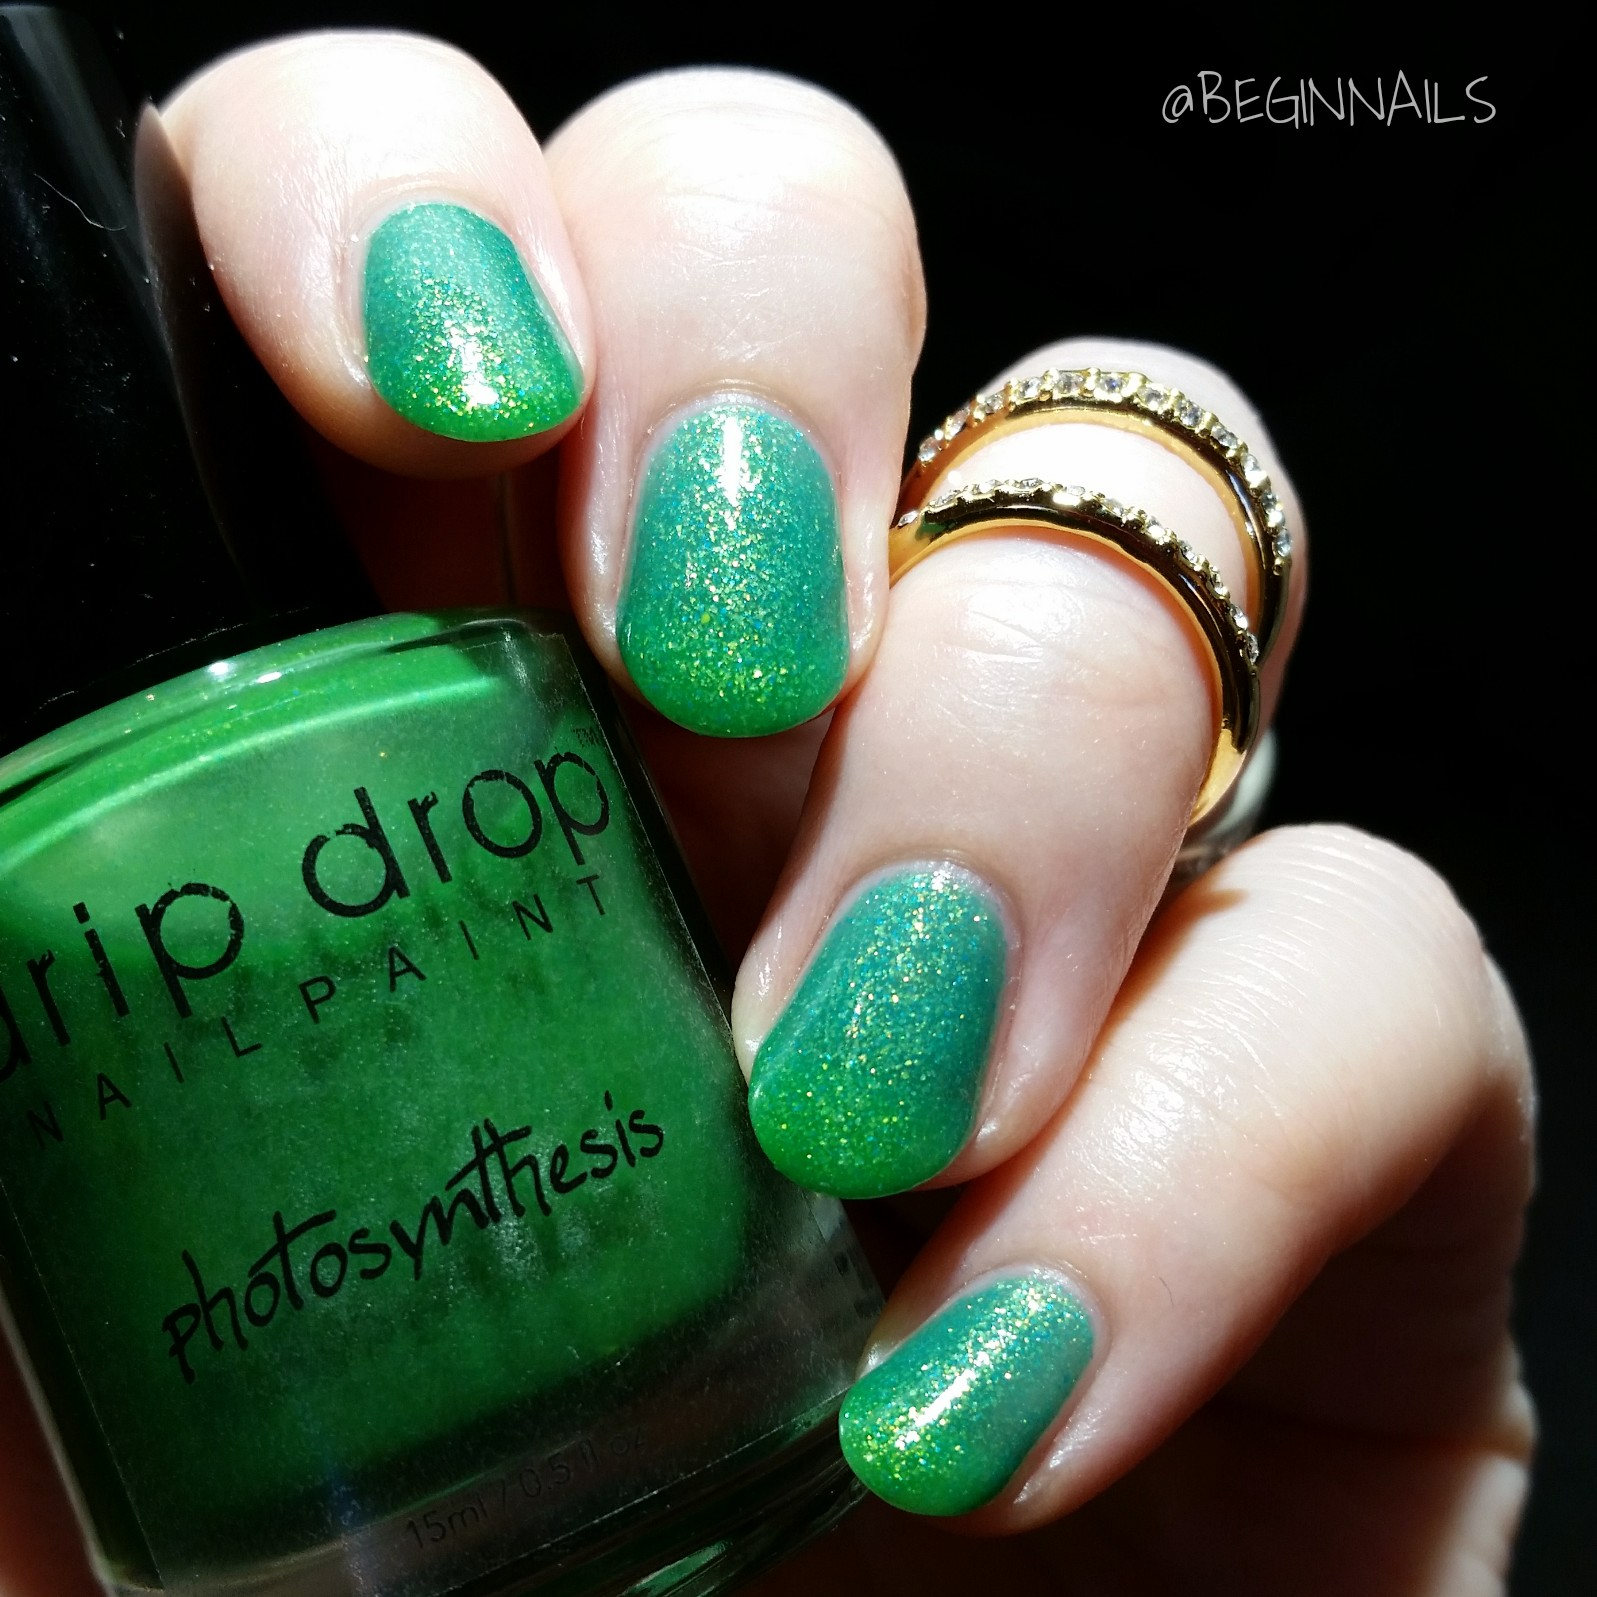 Finger Nail Paint: Let's Begin Nails: Drip Drop Nail Paint Mystery Trio